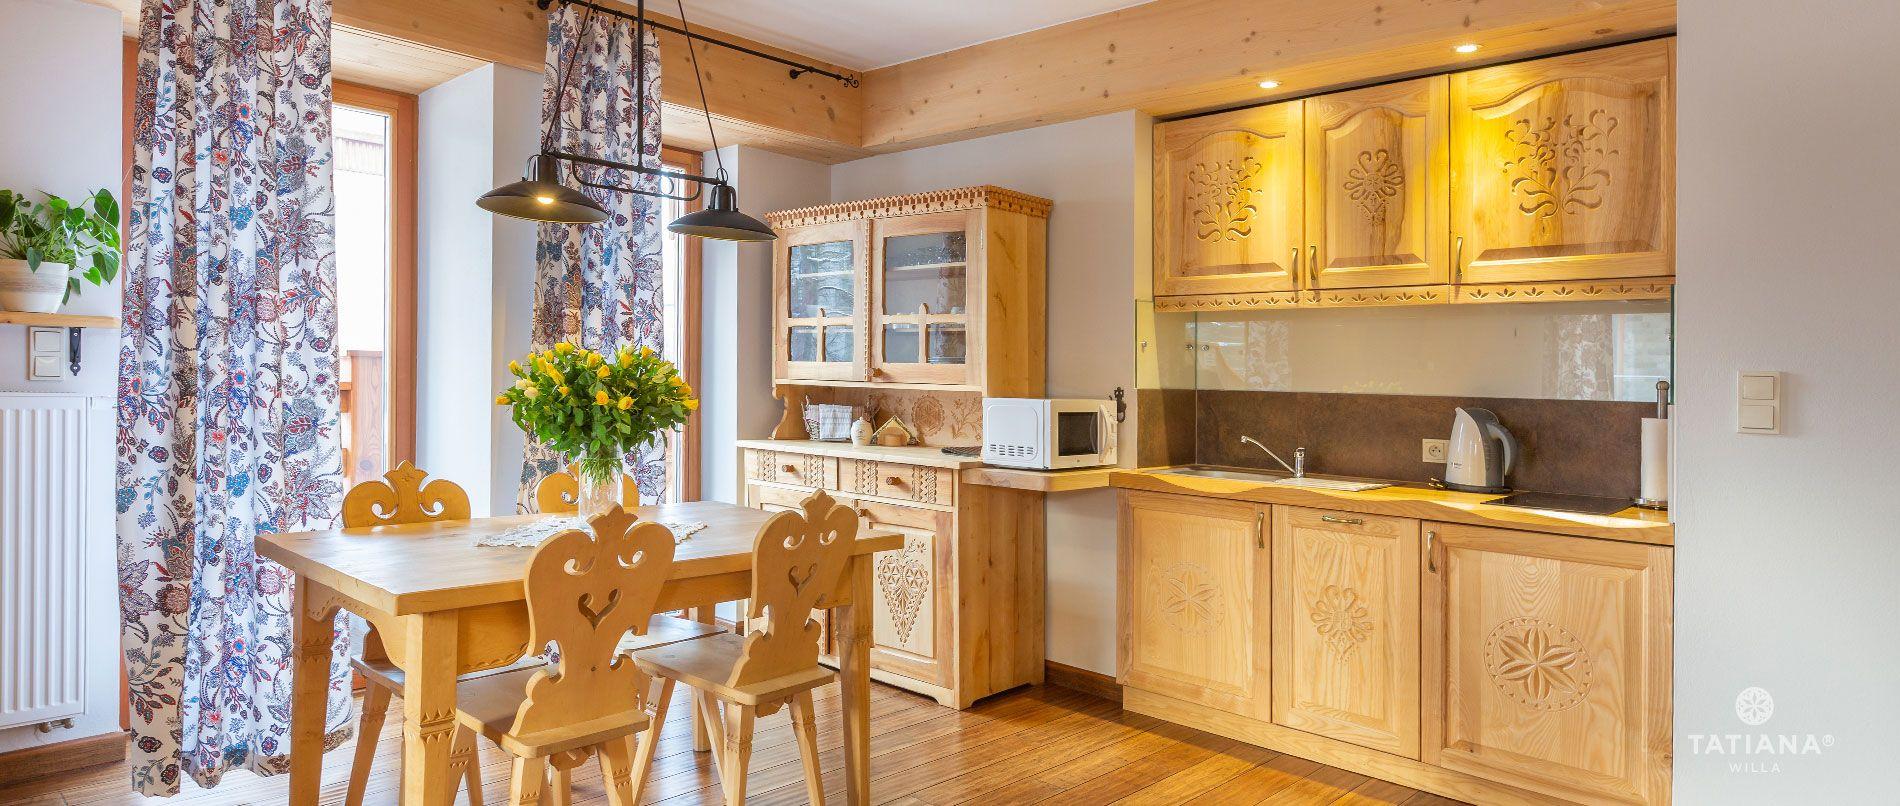 Apartament Lux 12- aneks kuchenny